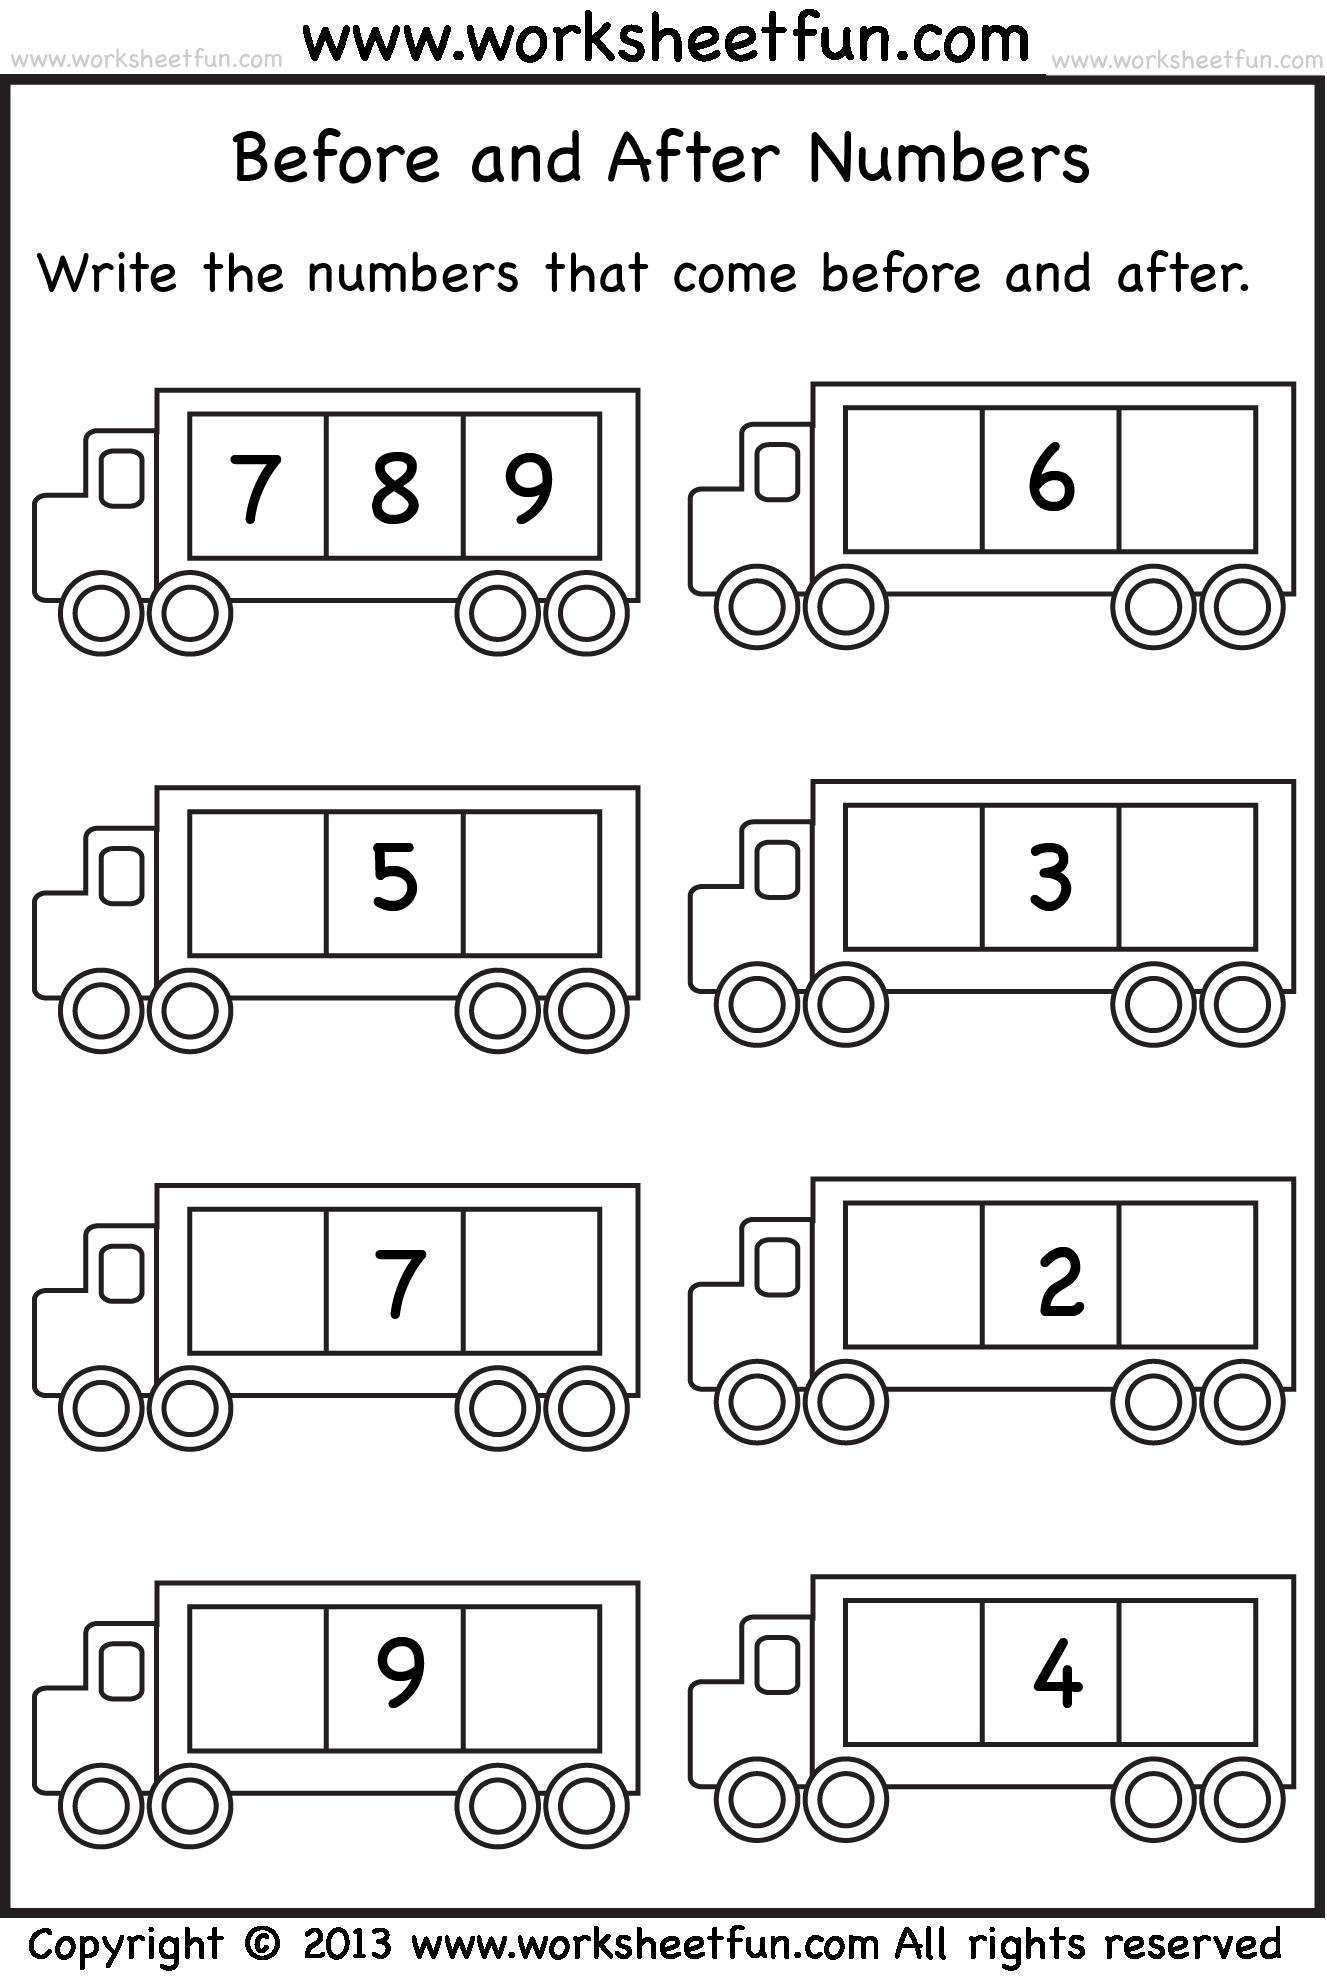 Math Worksheets Free Printable Worksheets In 2020 Kindergarten Math Worksheets Free Kindergarten Math Worksheets Math Worksheets